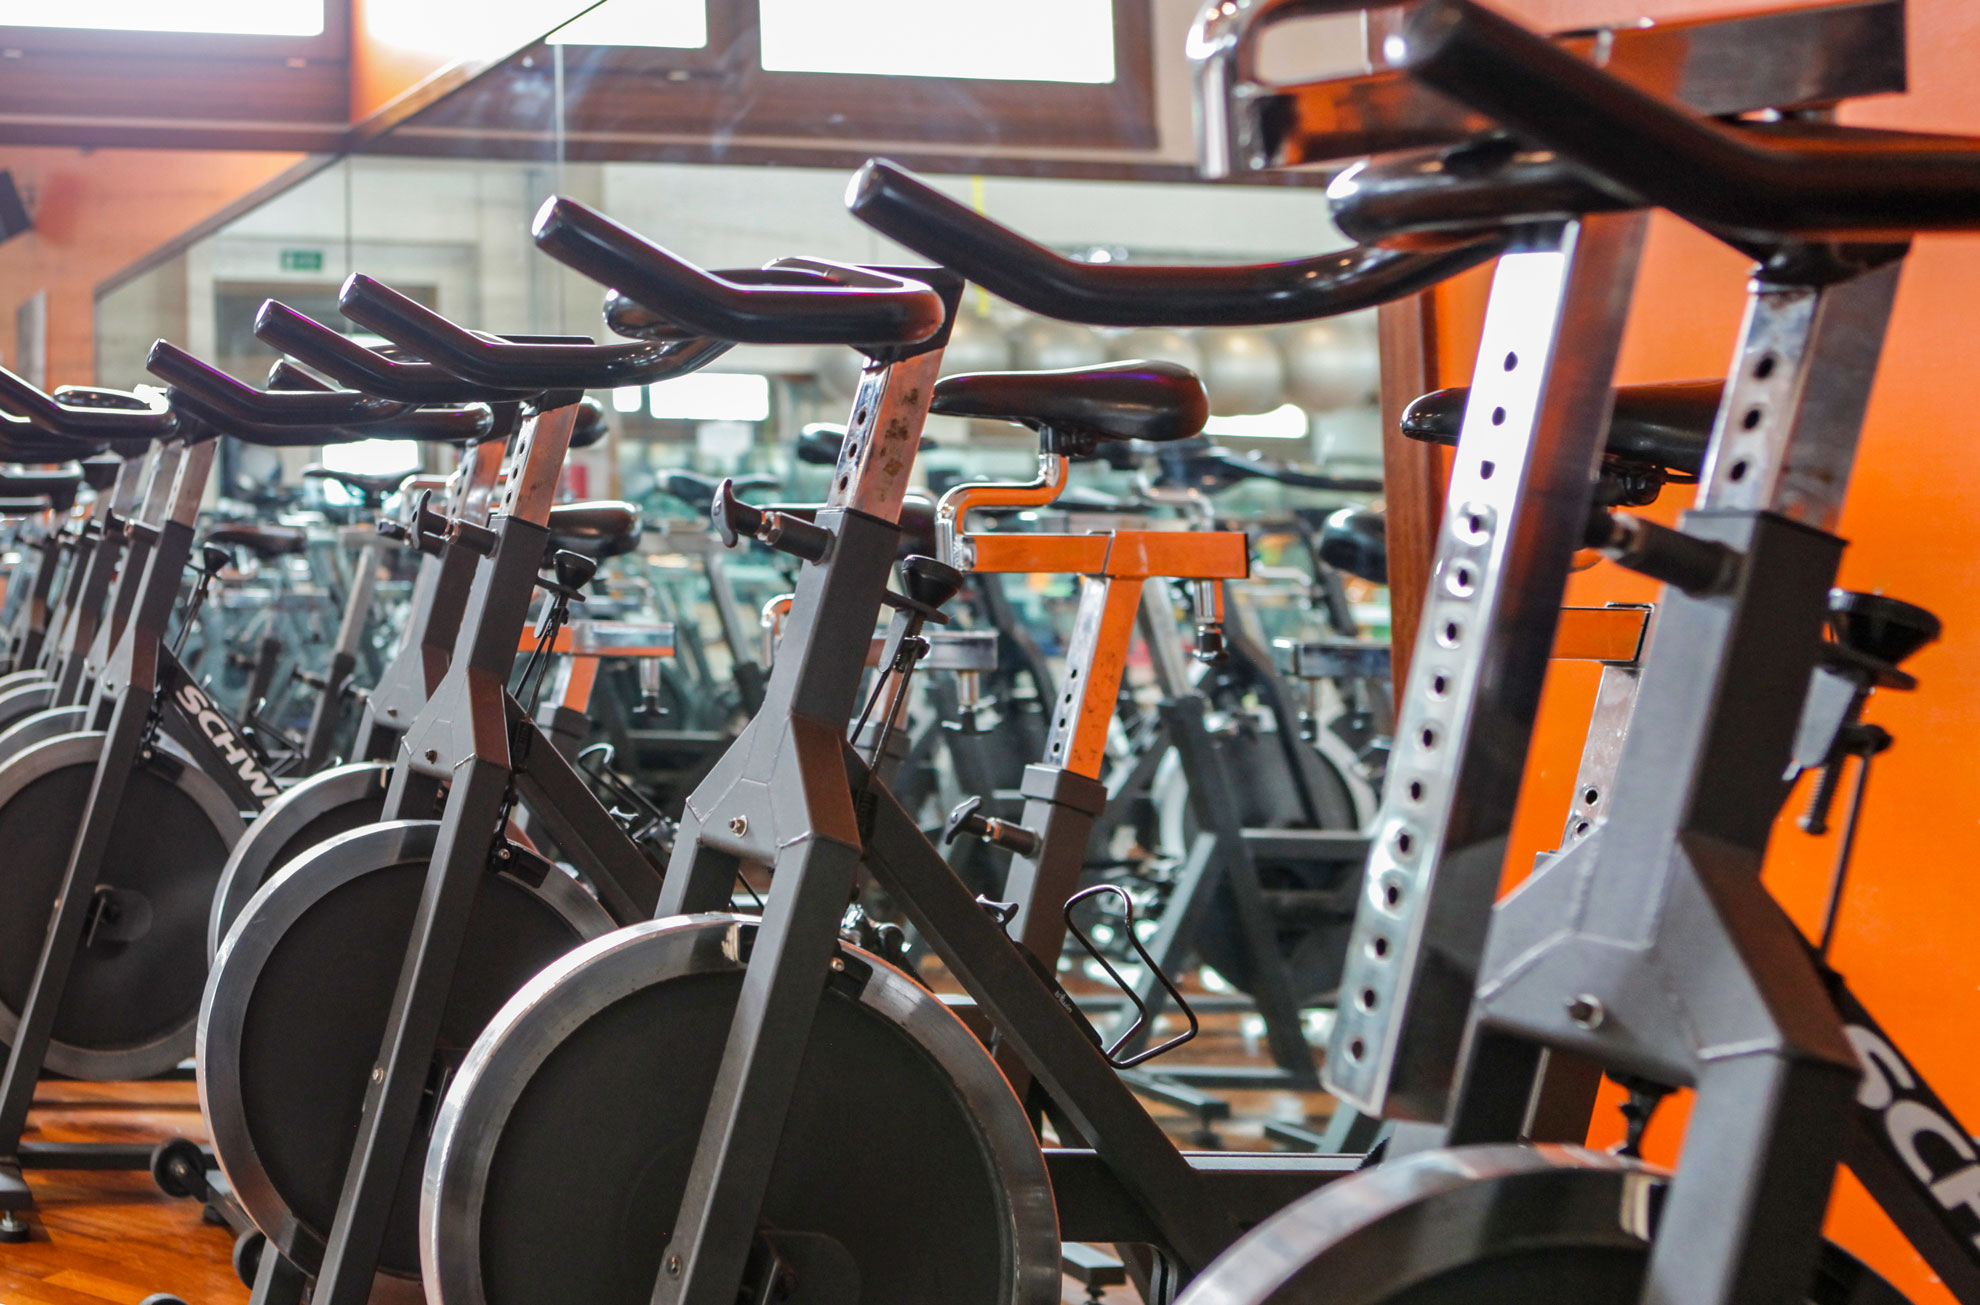 Palestra SportFly Wellness Club Sora